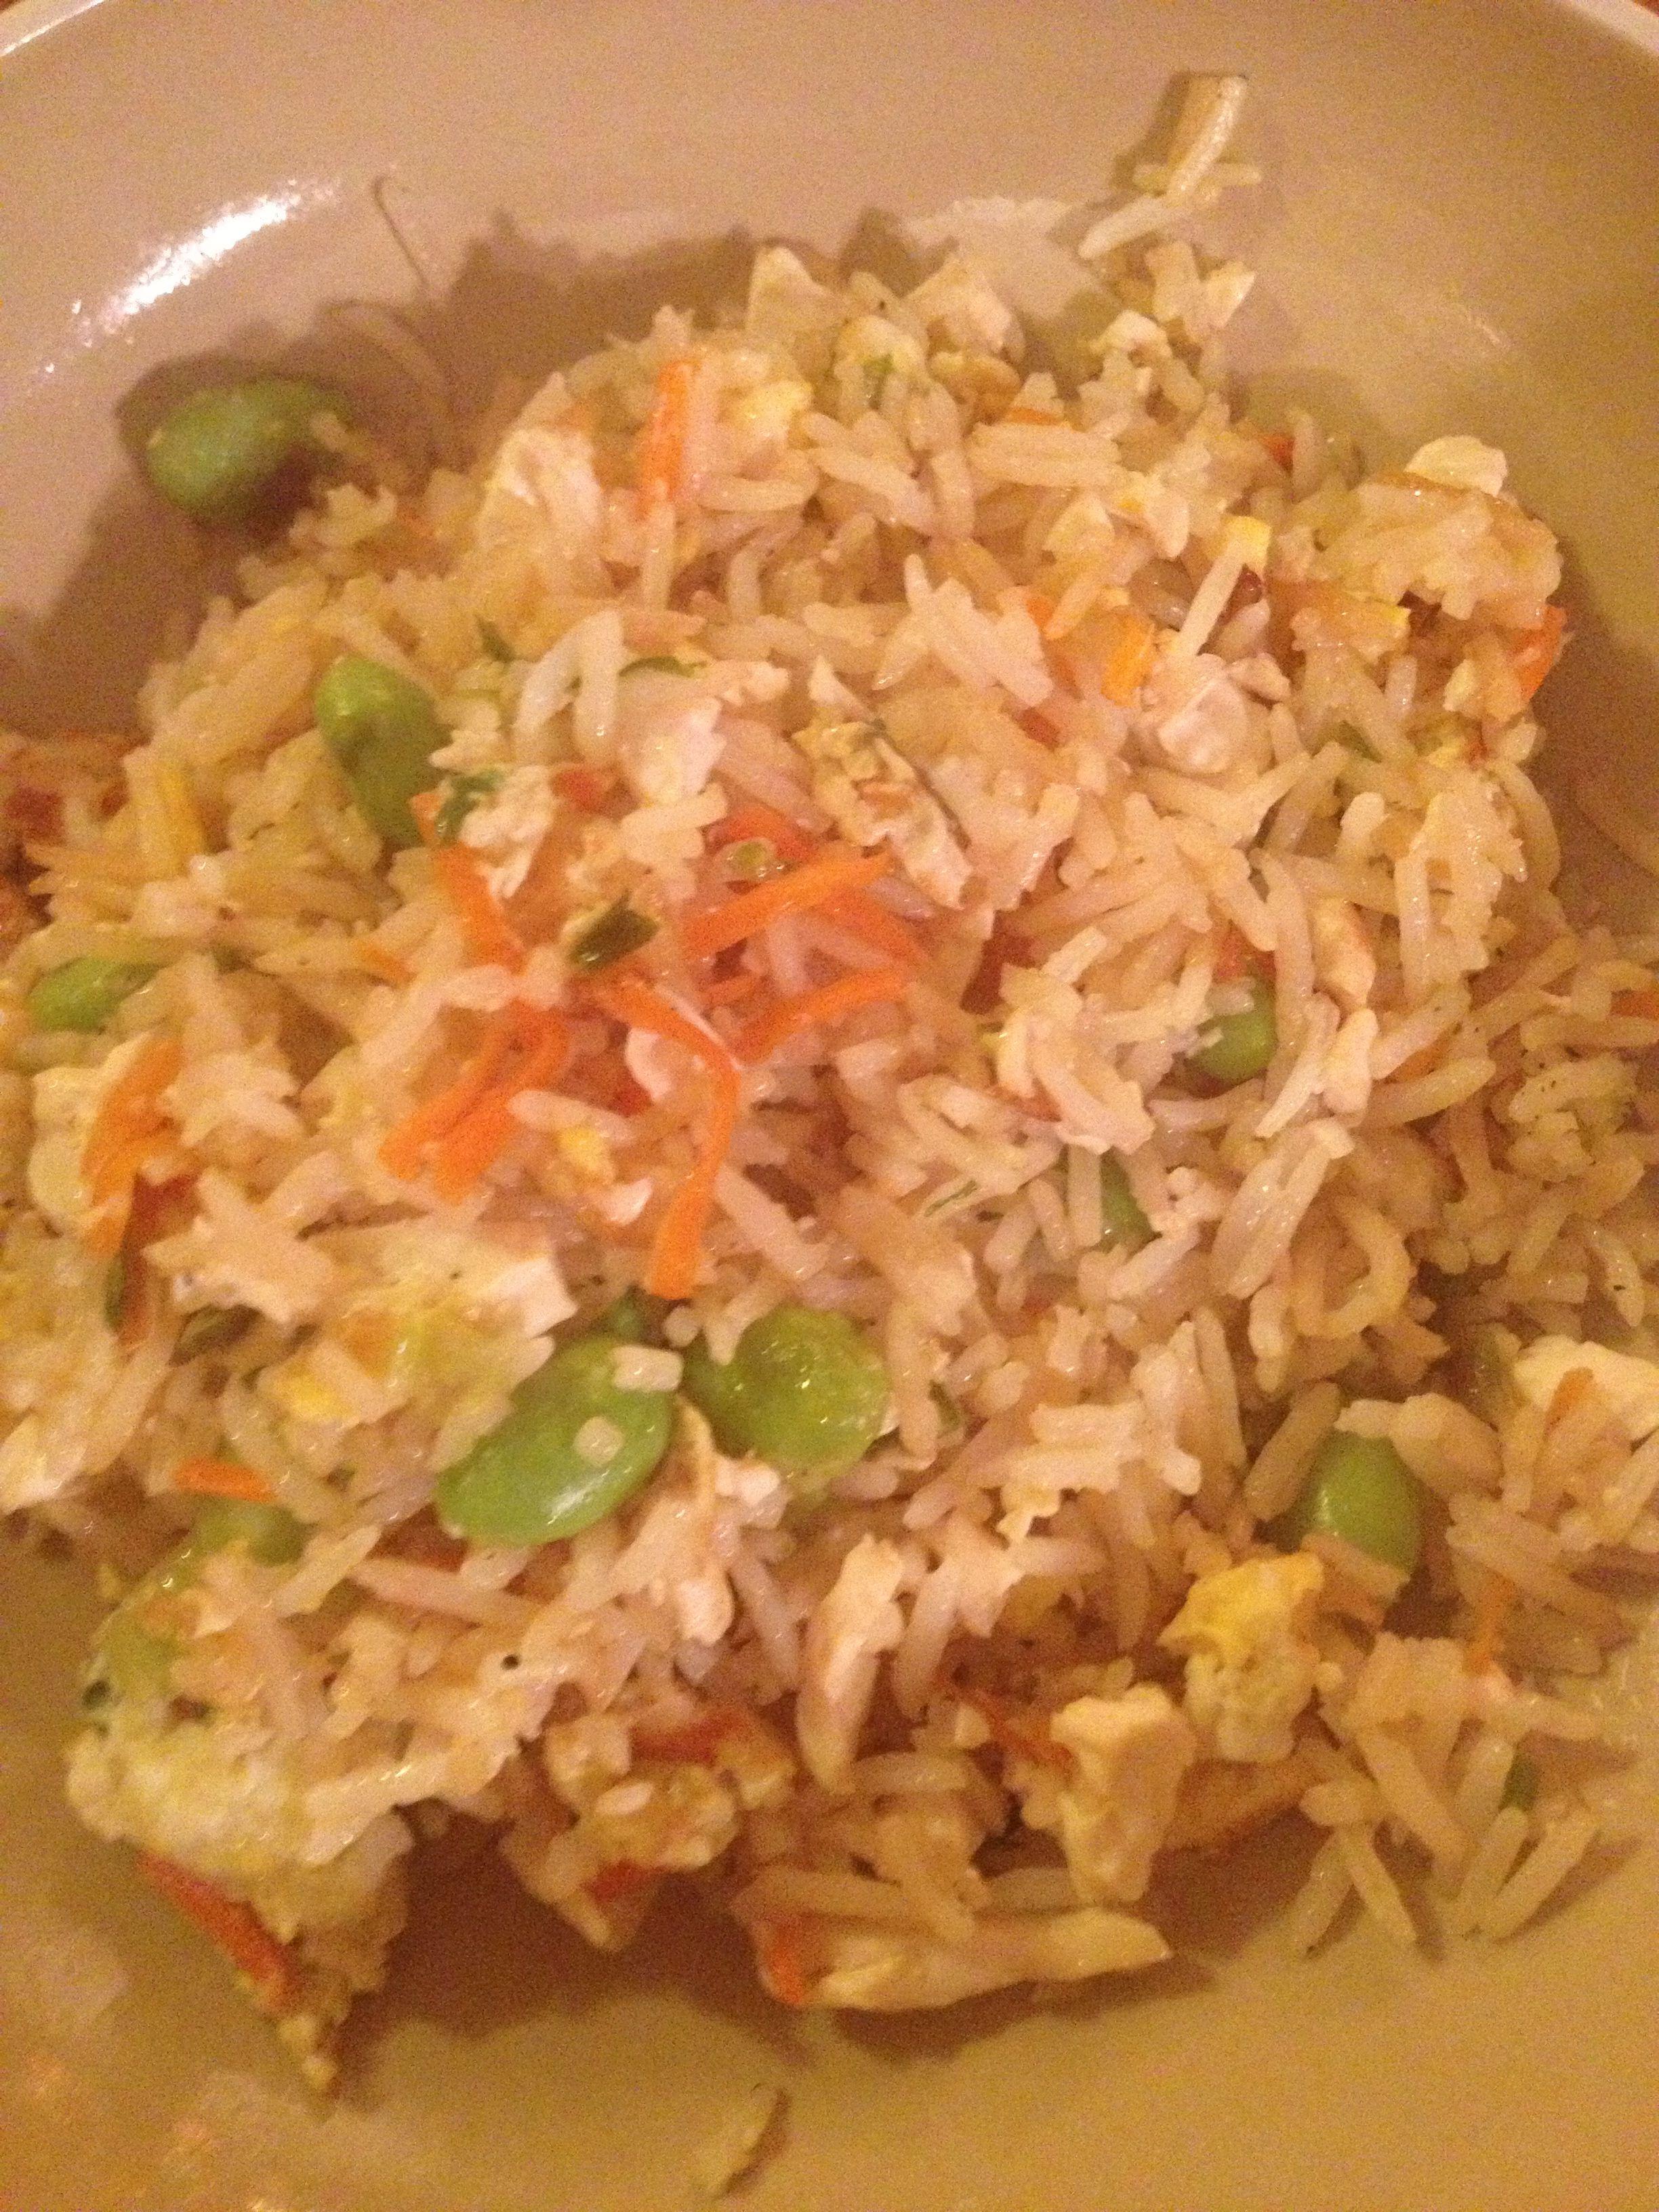 Watson dinner. Vegetarian asian stir fry. 5 stars from whole fam!